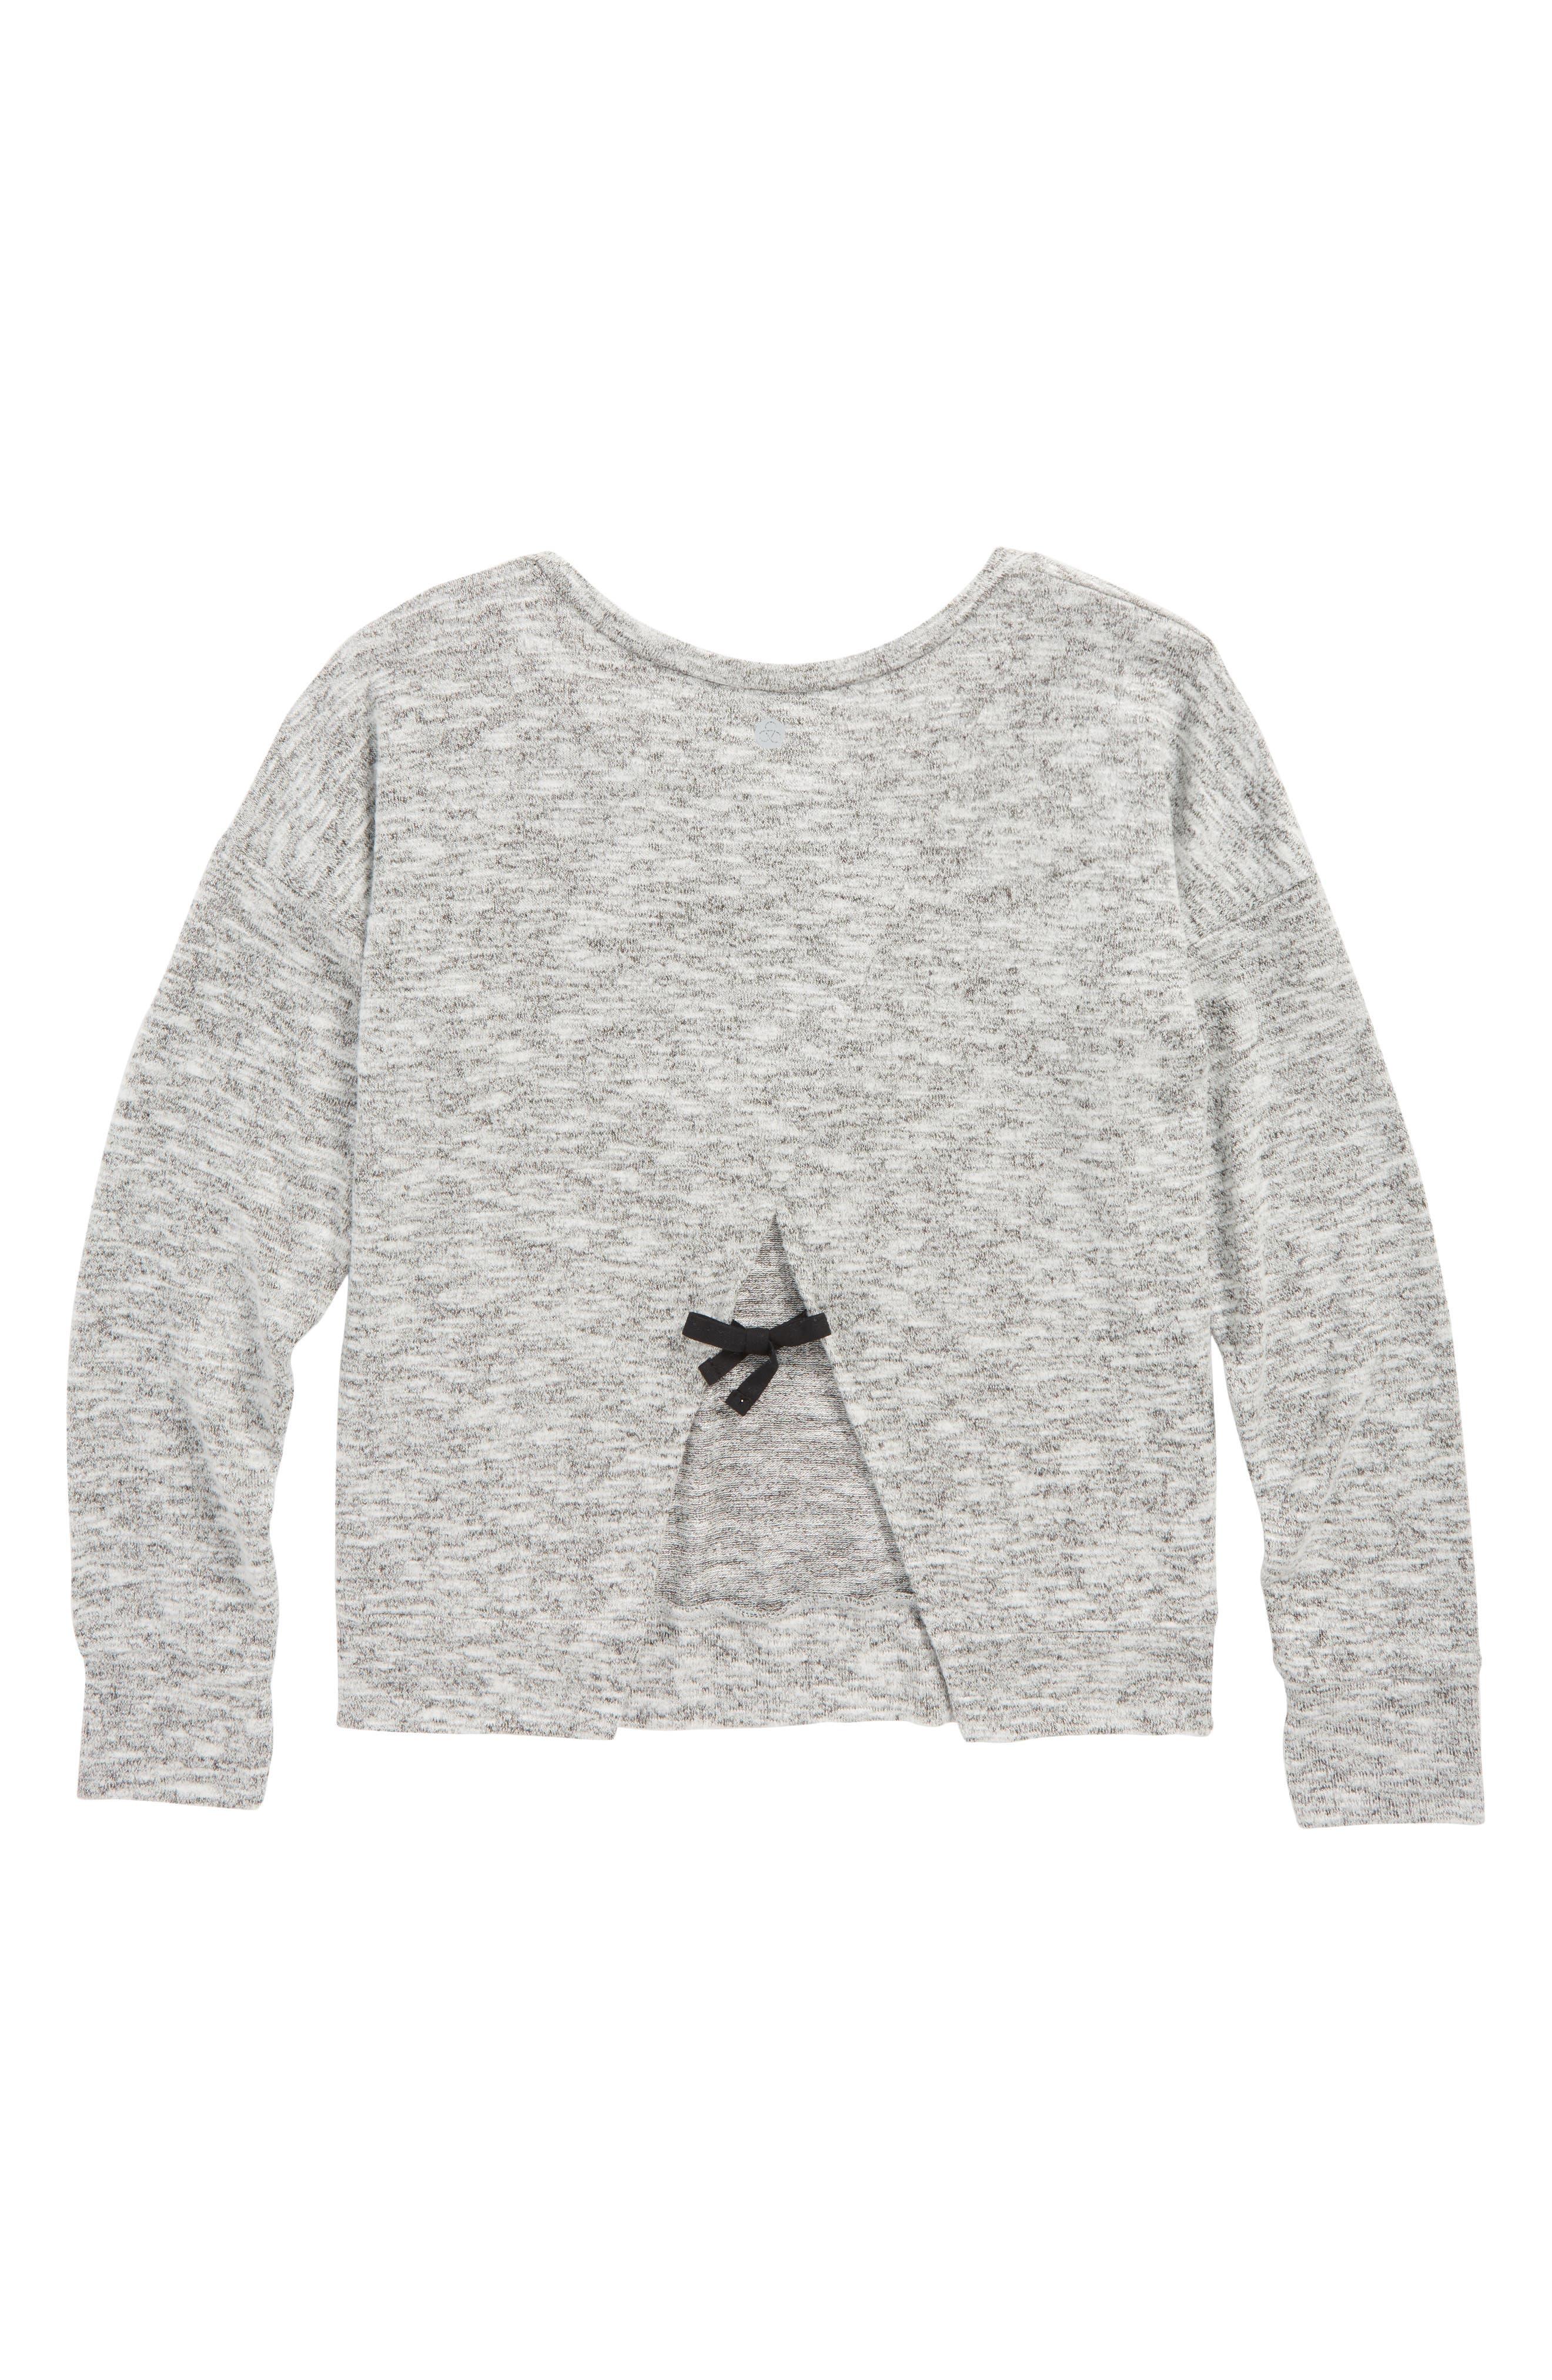 Zella Open Back Sweater,                             Alternate thumbnail 2, color,                             Black- White